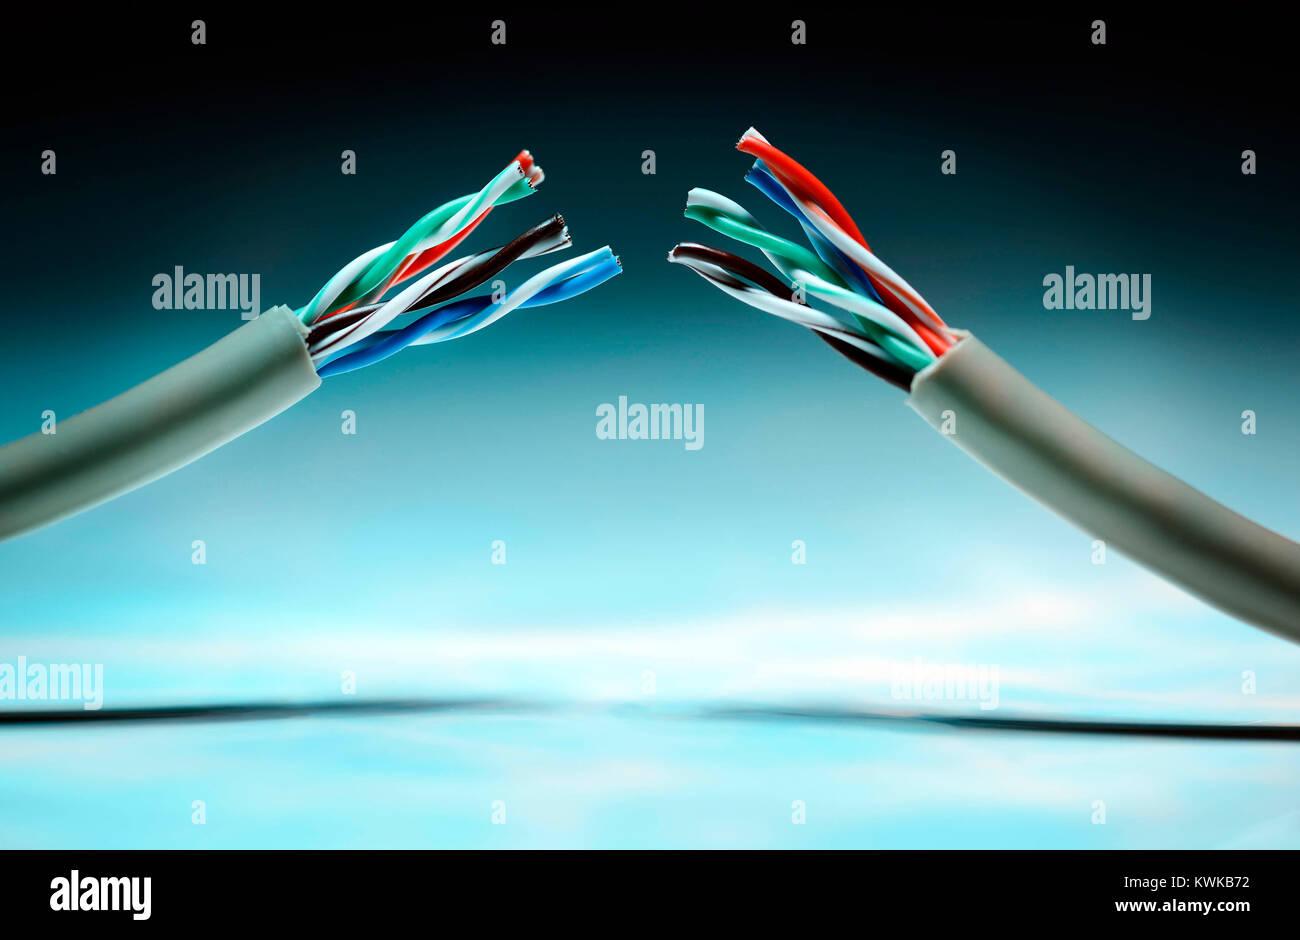 Cut data cable, safe Harbor data protection agreements, Durchgeschnittenes Datenkabel, Safe Harbor Datenschutzabkommen Stock Photo